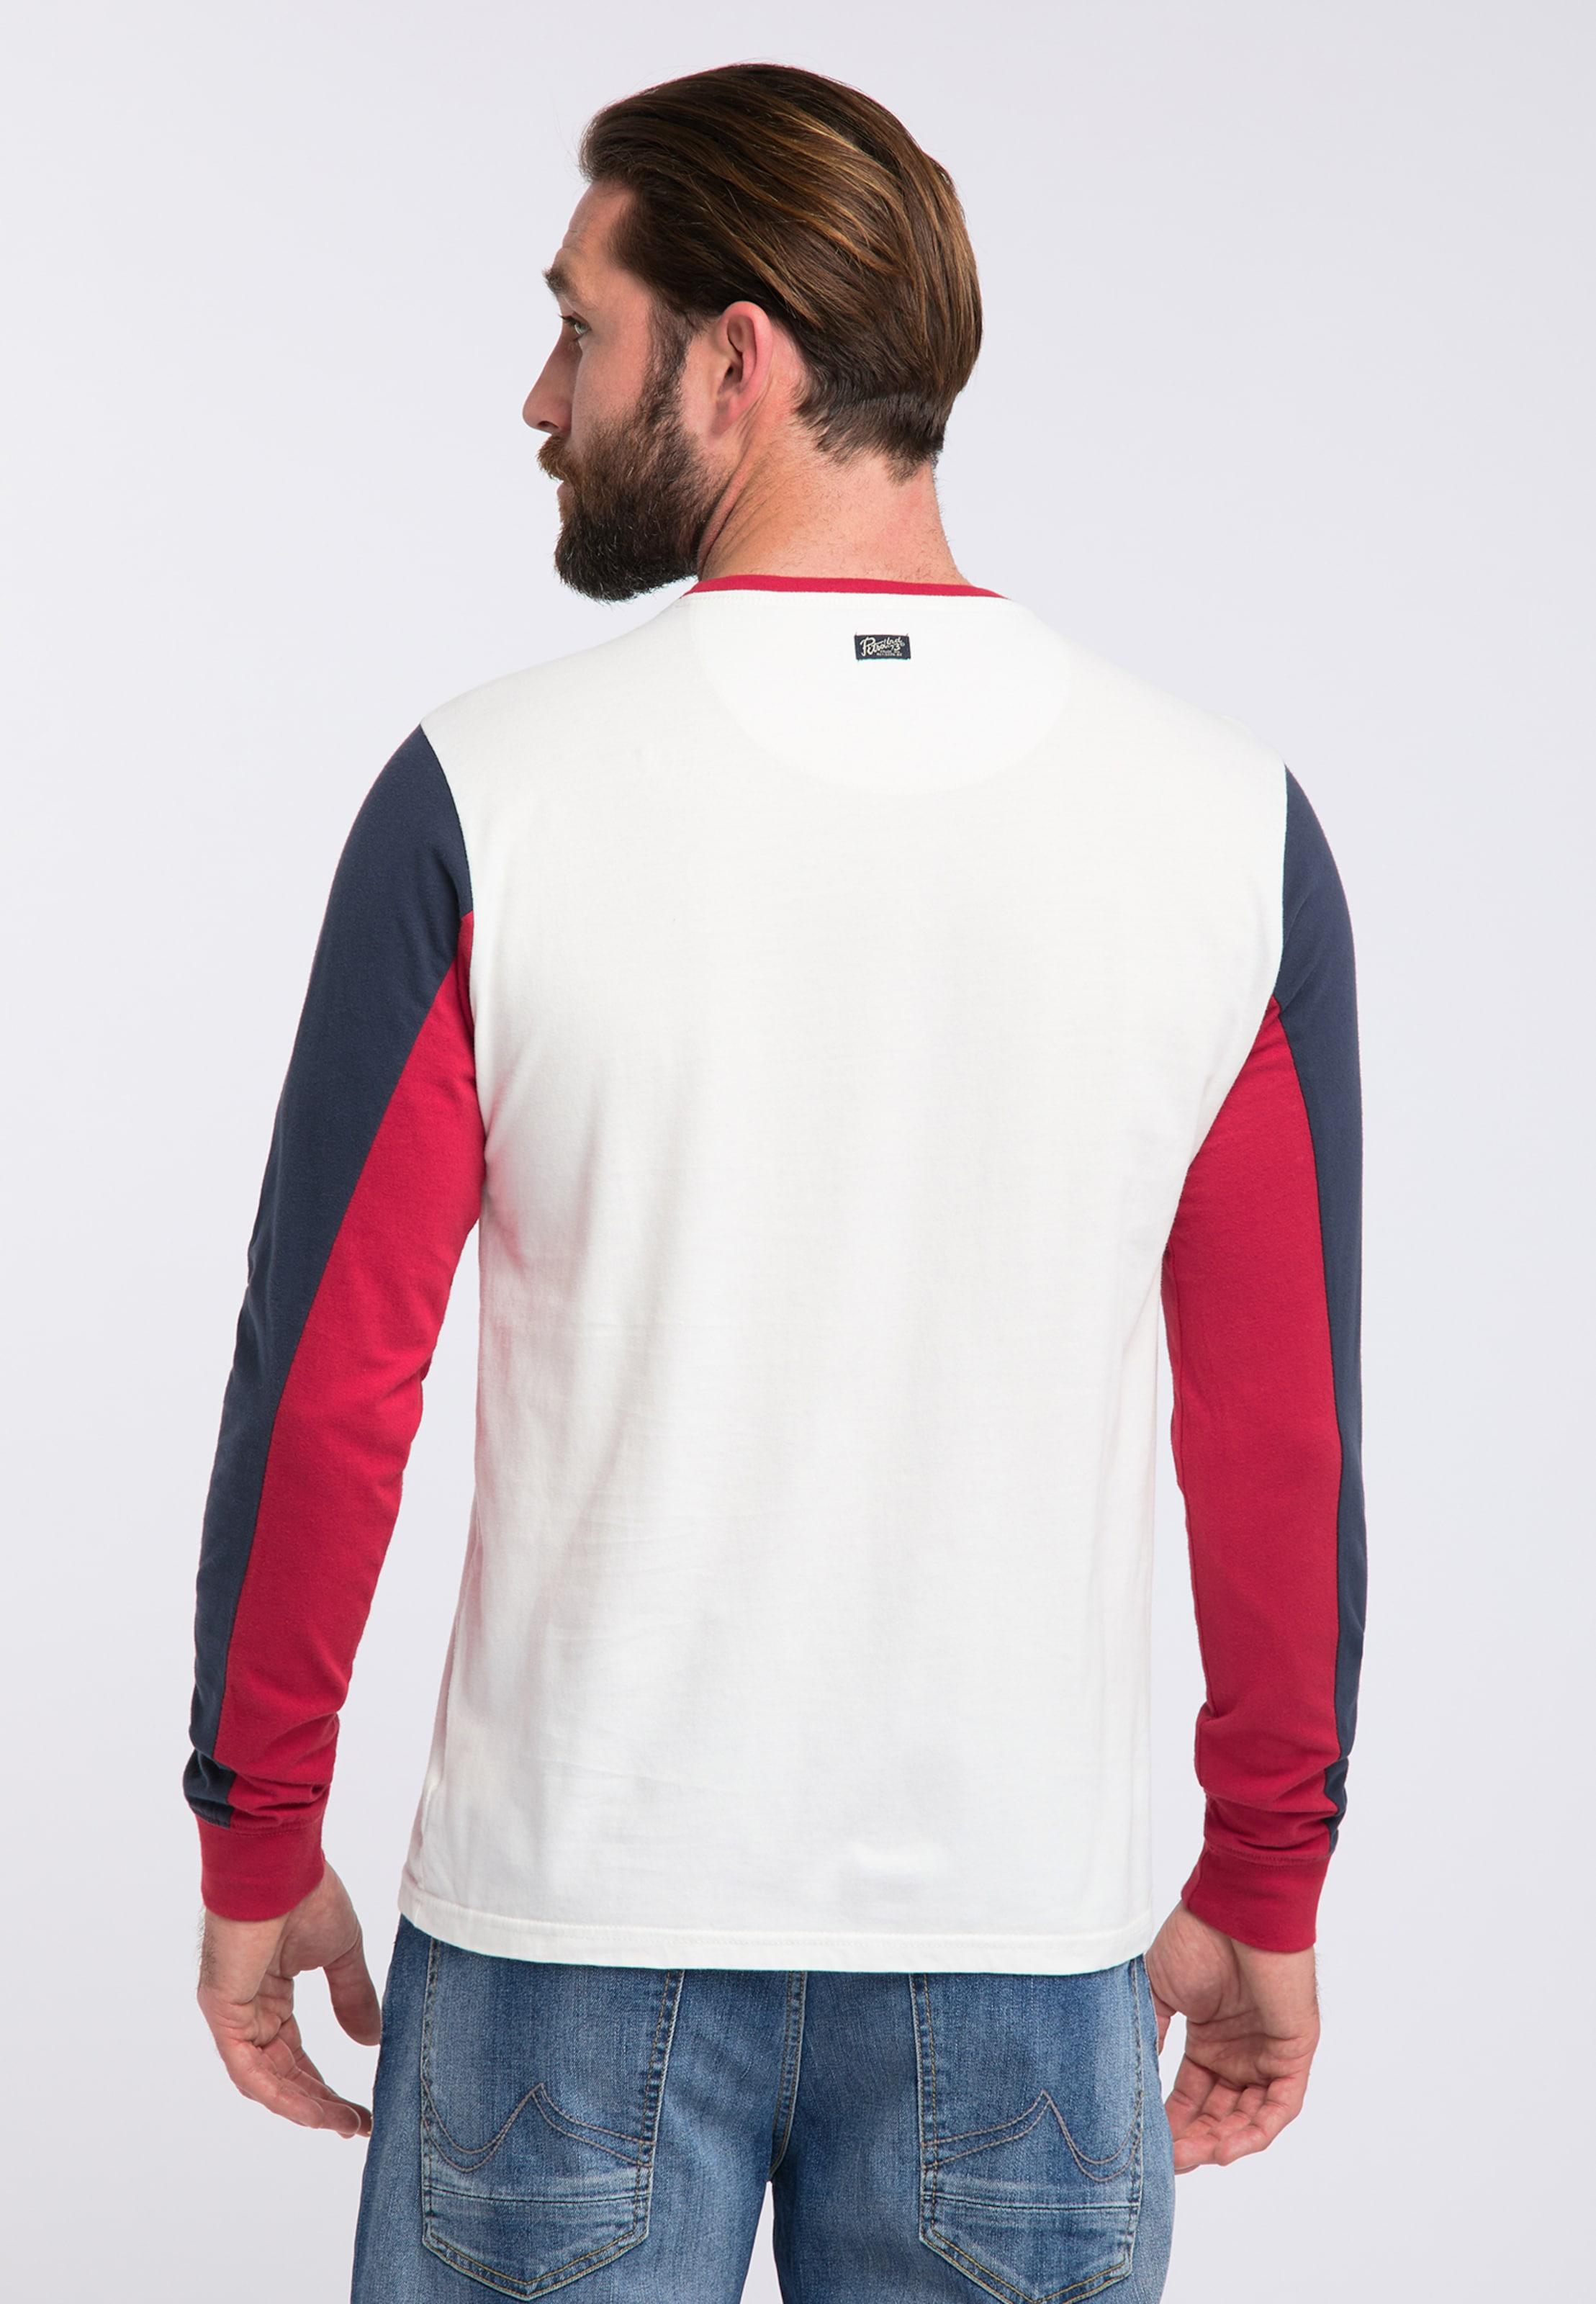 DunkelblauRot Weiß In Industries Shirt Petrol Nw80OPXZnk